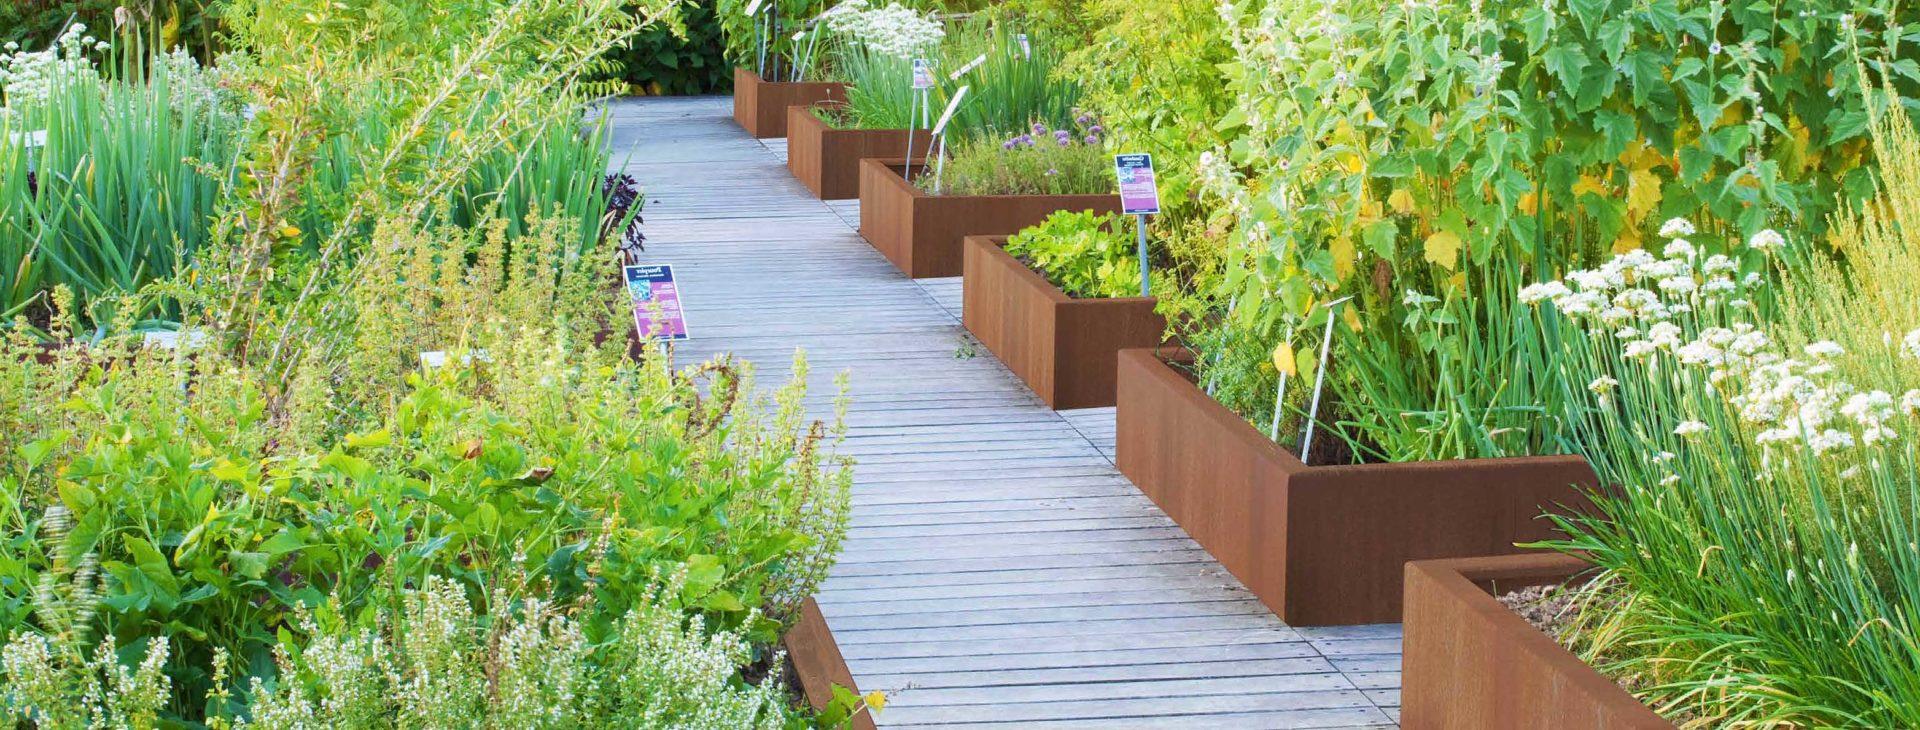 jardin potager surelevé avec bordures bacs en acier corten